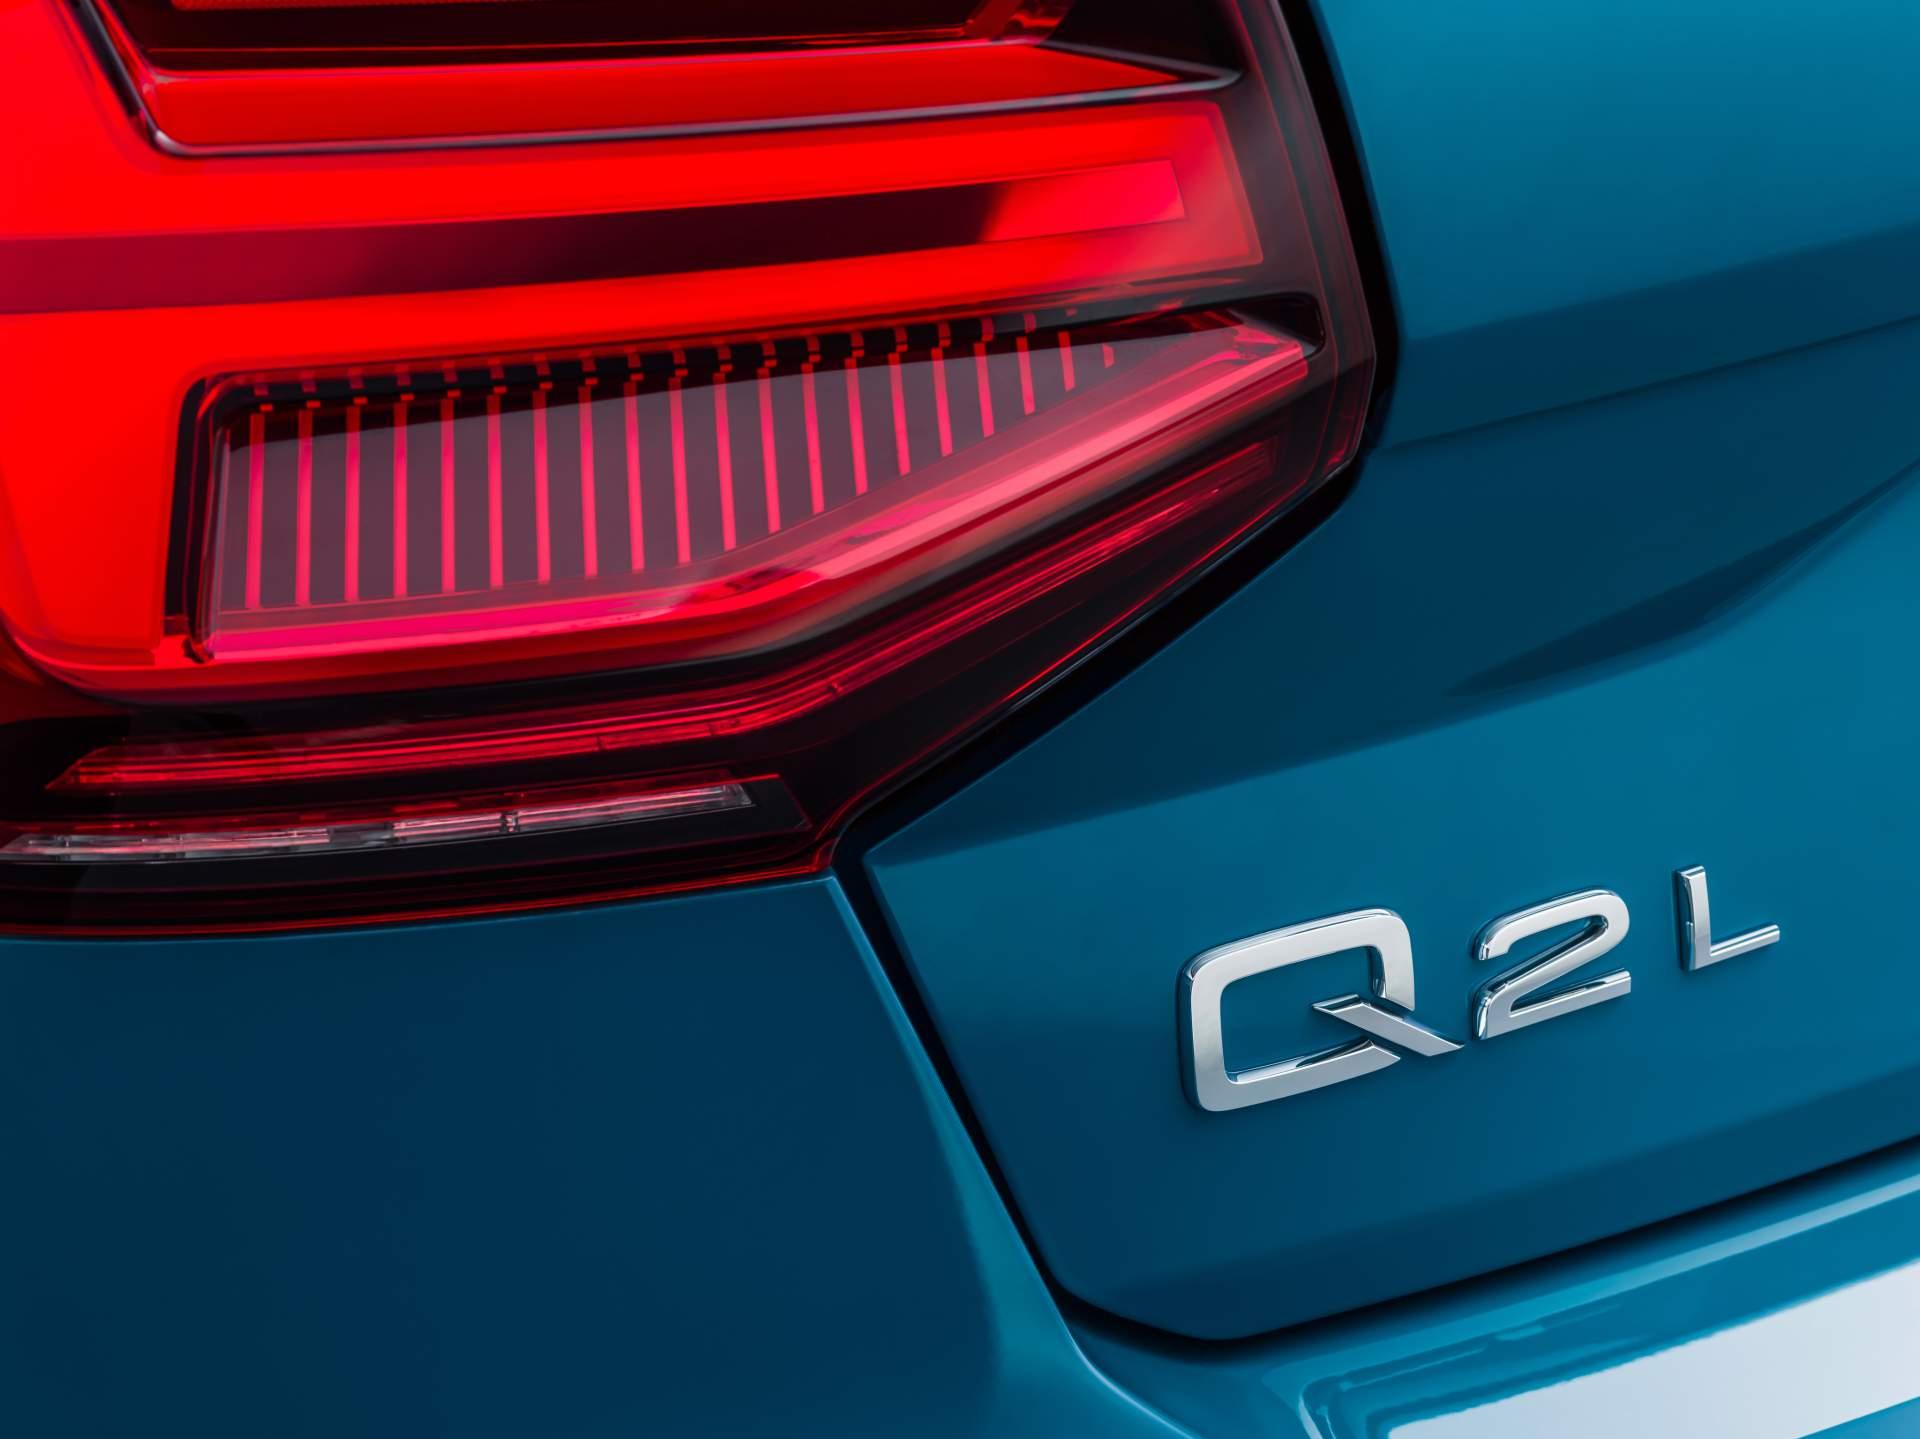 Audi_Q2_L_0057